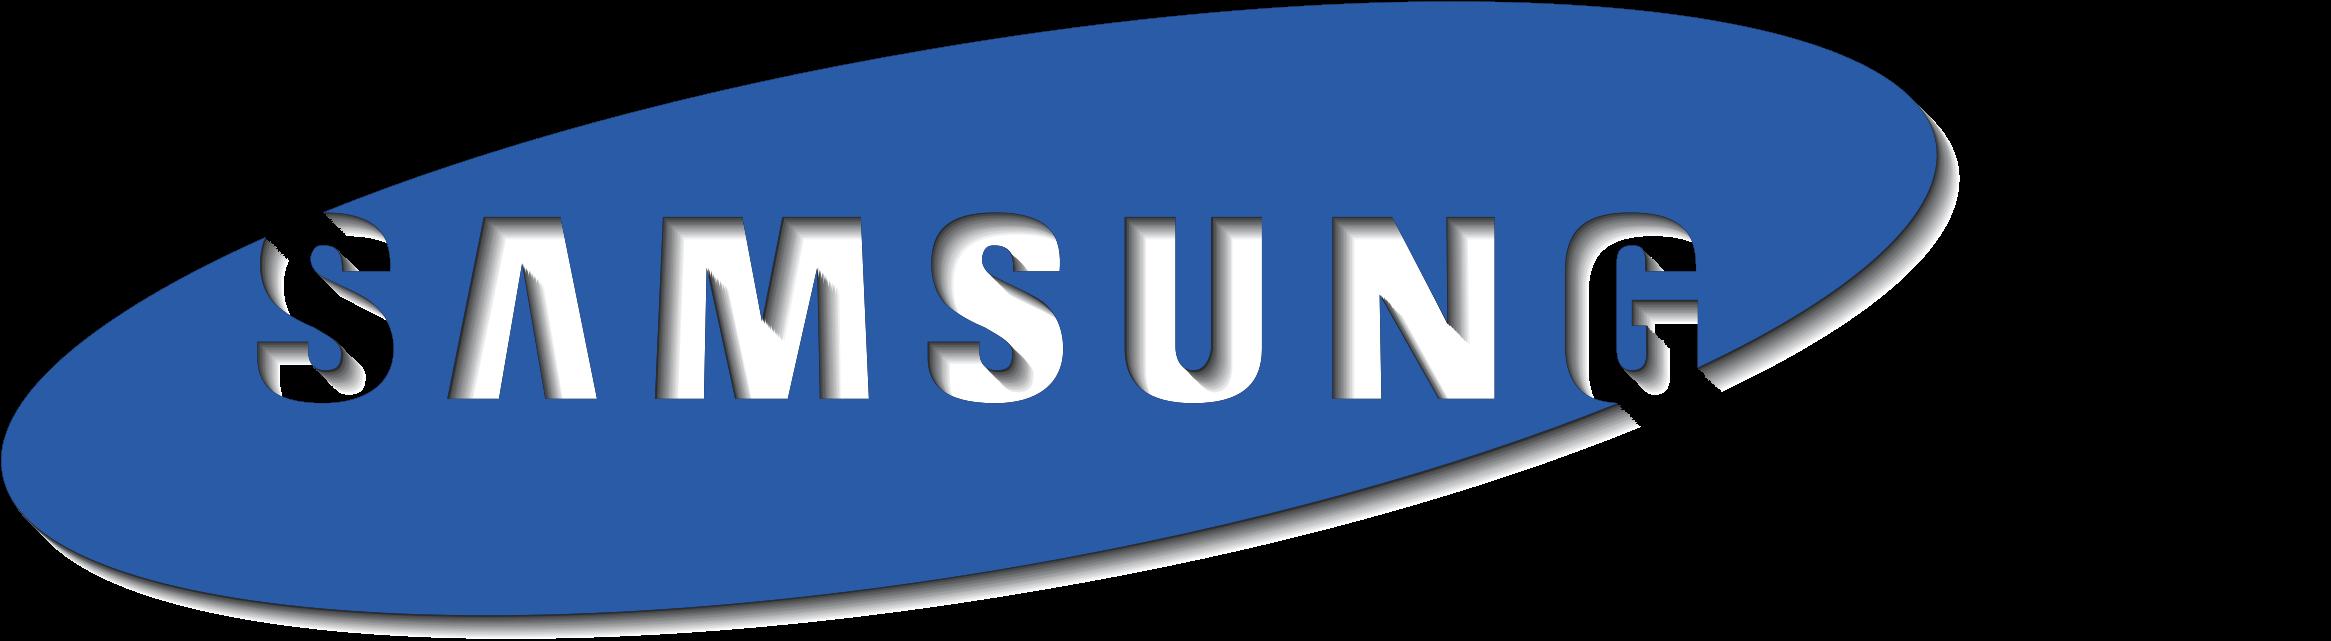 Samsung Logo Png Transparent - Samsung Logo No Limit (2400x2400), Png Download